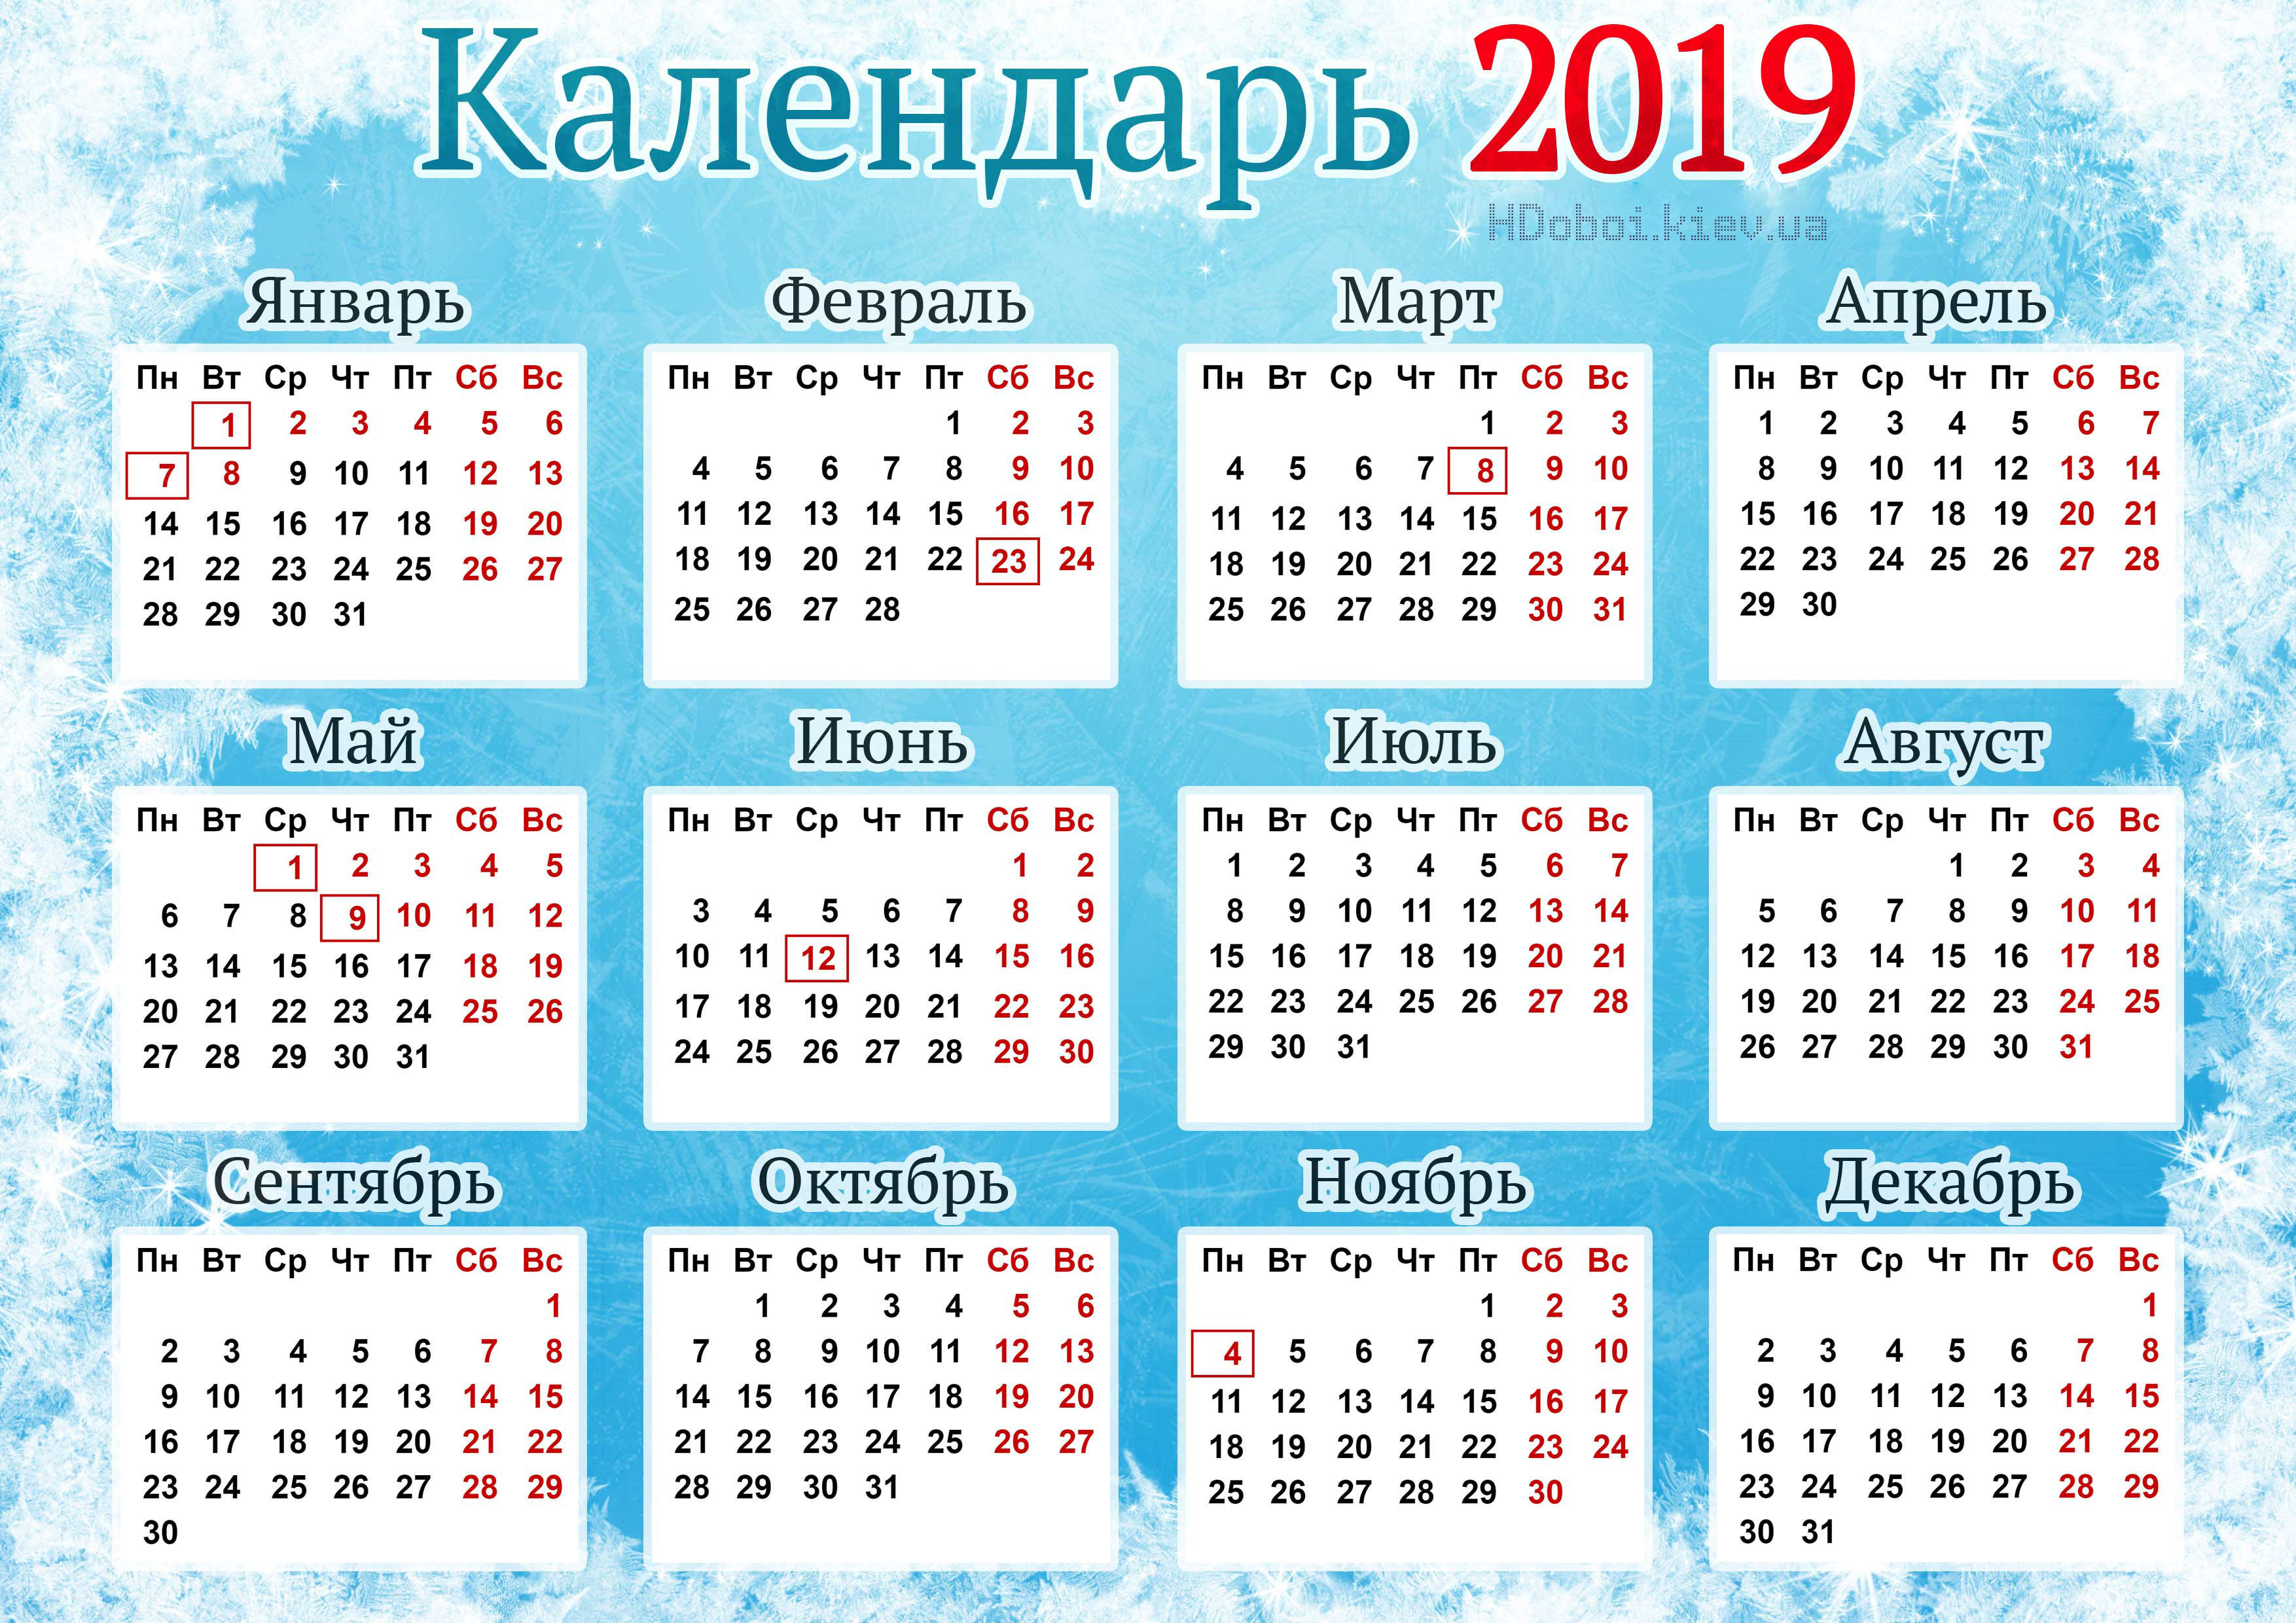 HDoboi.Kiev.ua - Календарь 2019, фон на рабочий стол 4к ultra hd